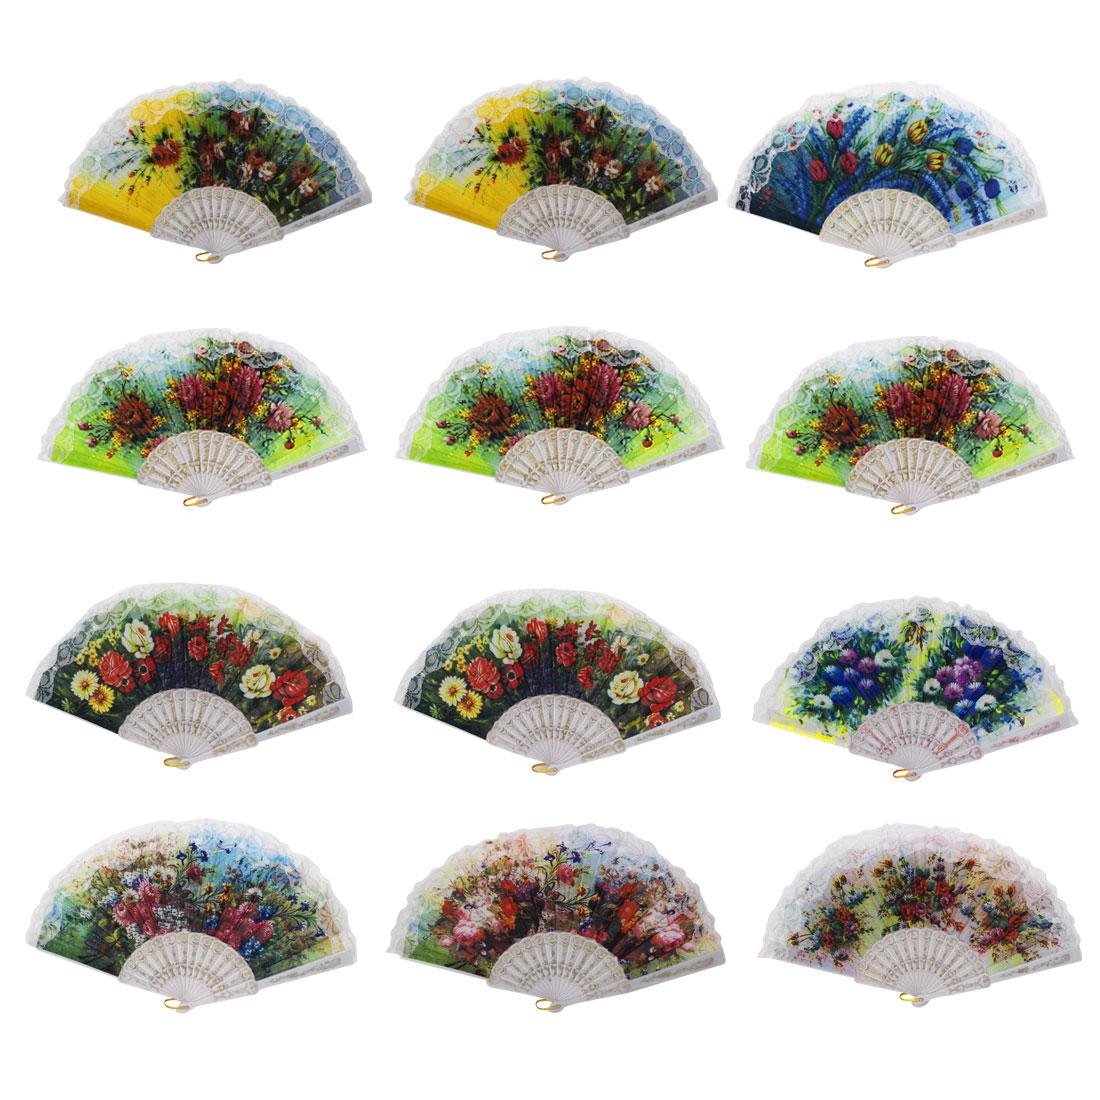 Plastic Frame Flower Pattern Lace Trim Wedding Party Dance Folding Fan 12pcs